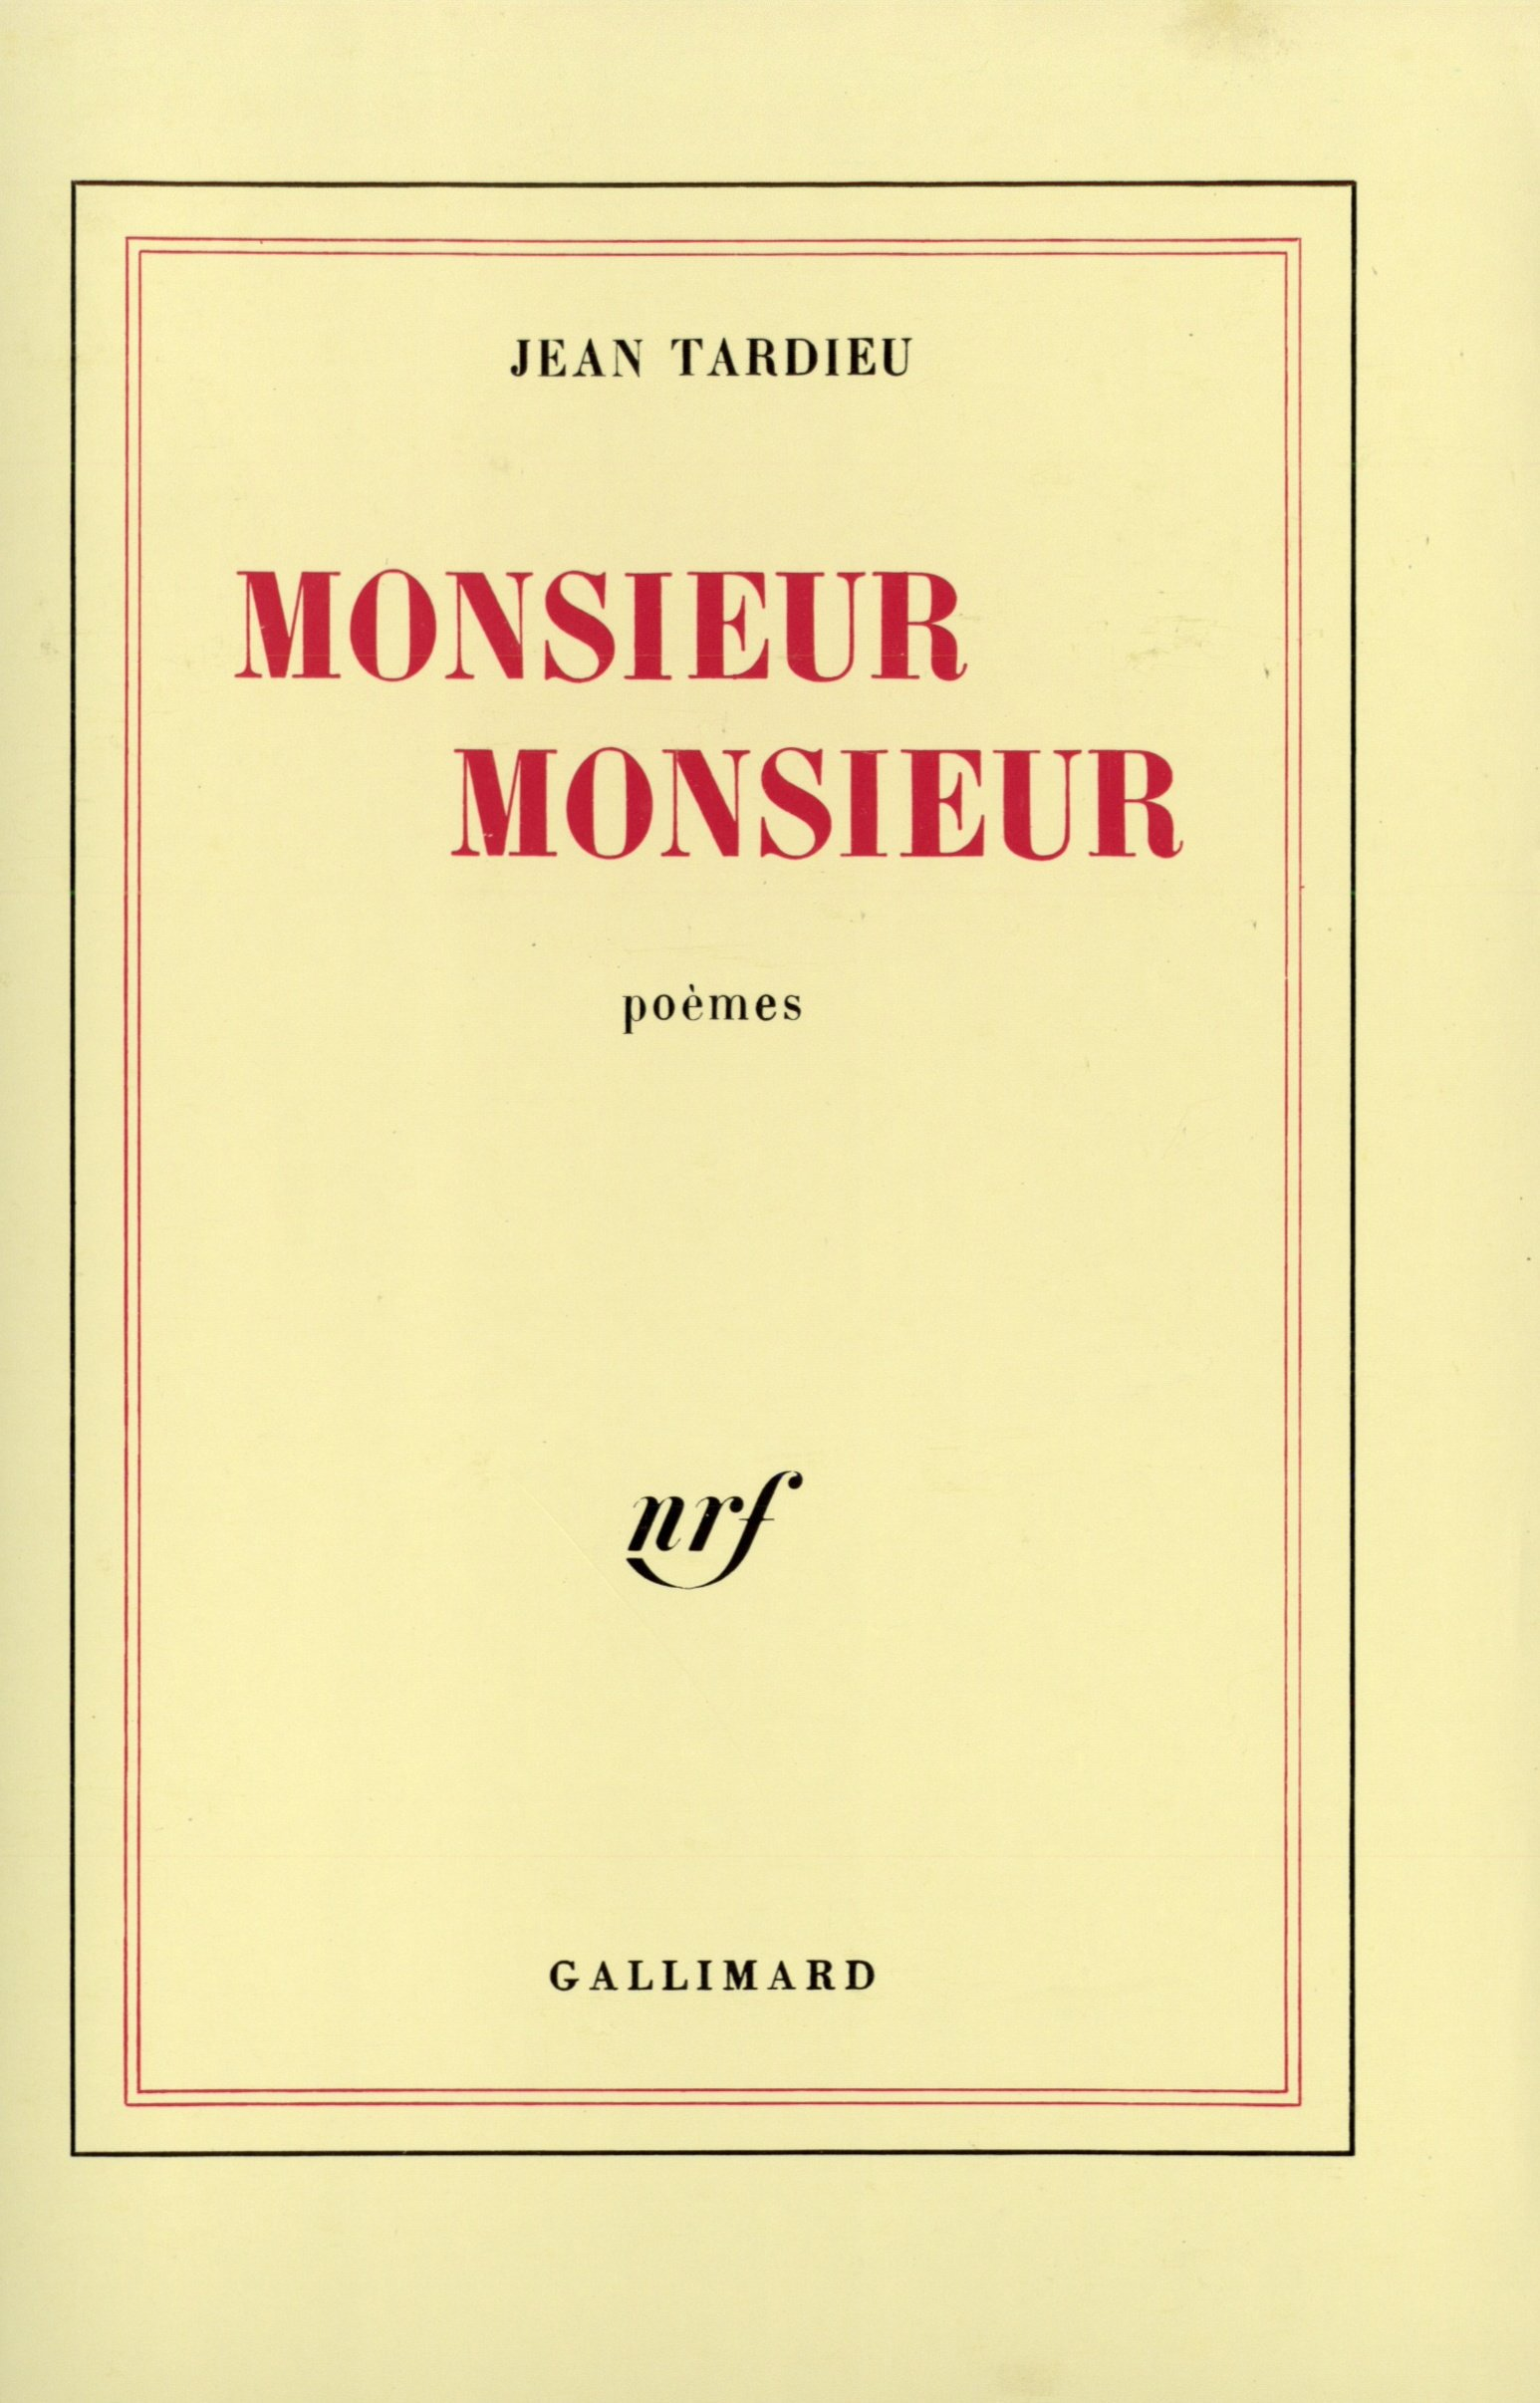 Monsieur Monsieur Blanche Amazones Jean Tardieu Libros